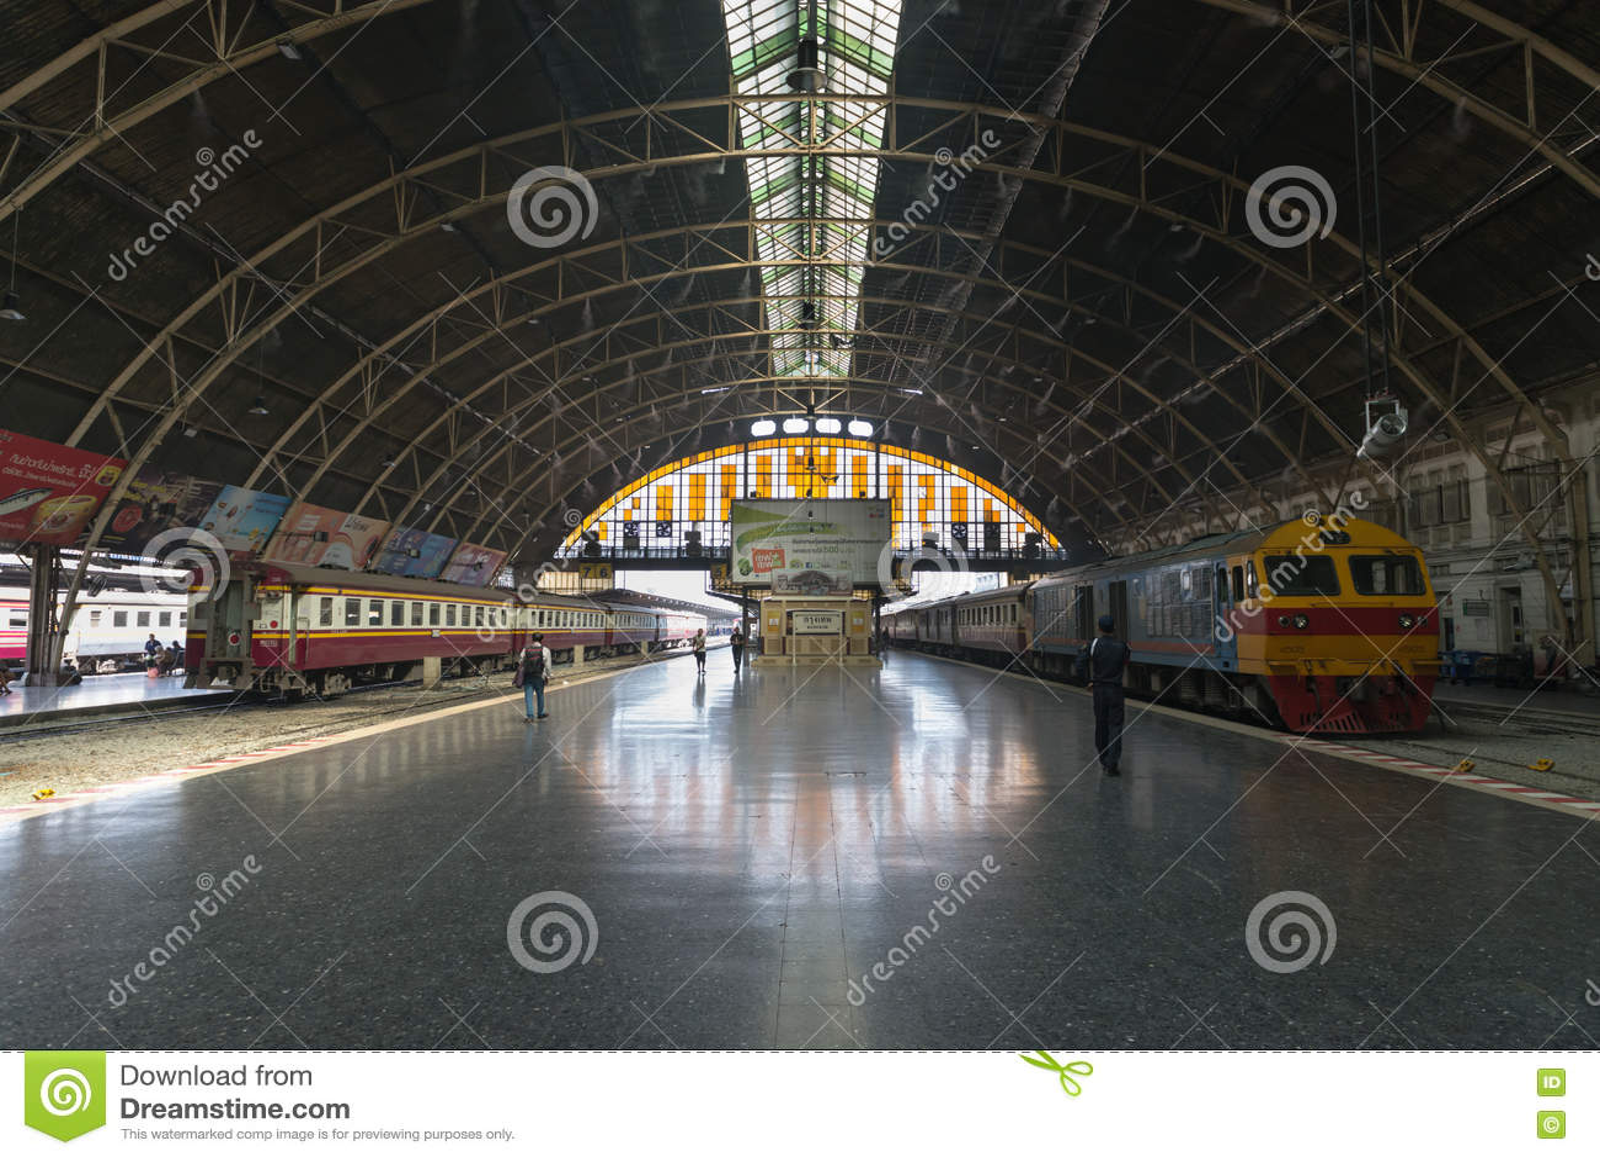 Plataforma Del Embarque En Hua Lamphong Railway Station En Bangkok Fotografía editorial